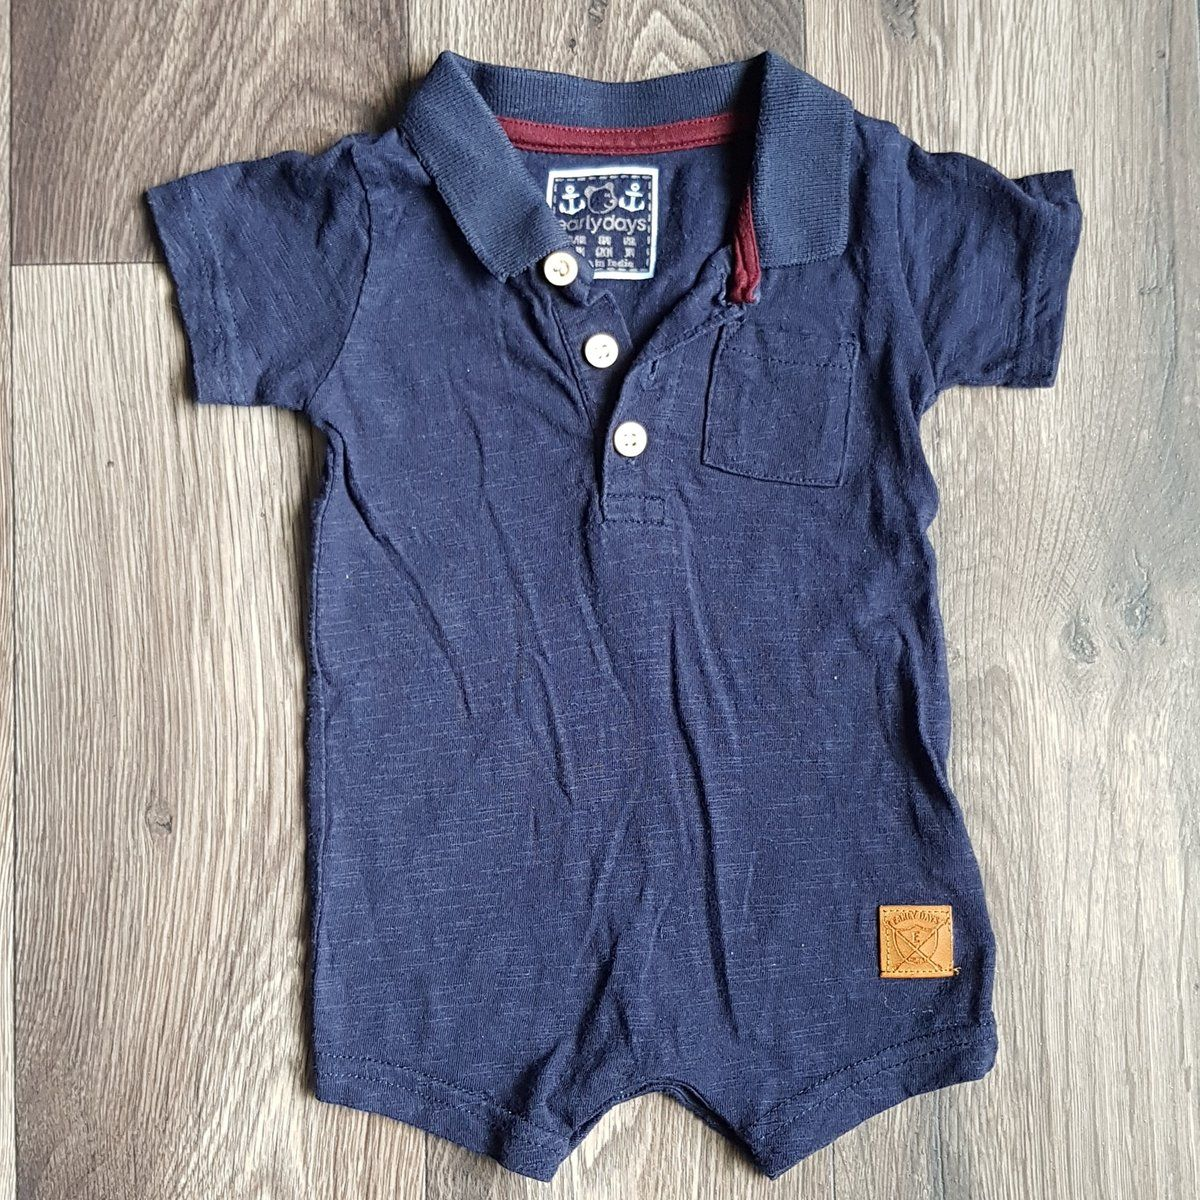 Dark blue / navy short sleeved romper outfit 03 months